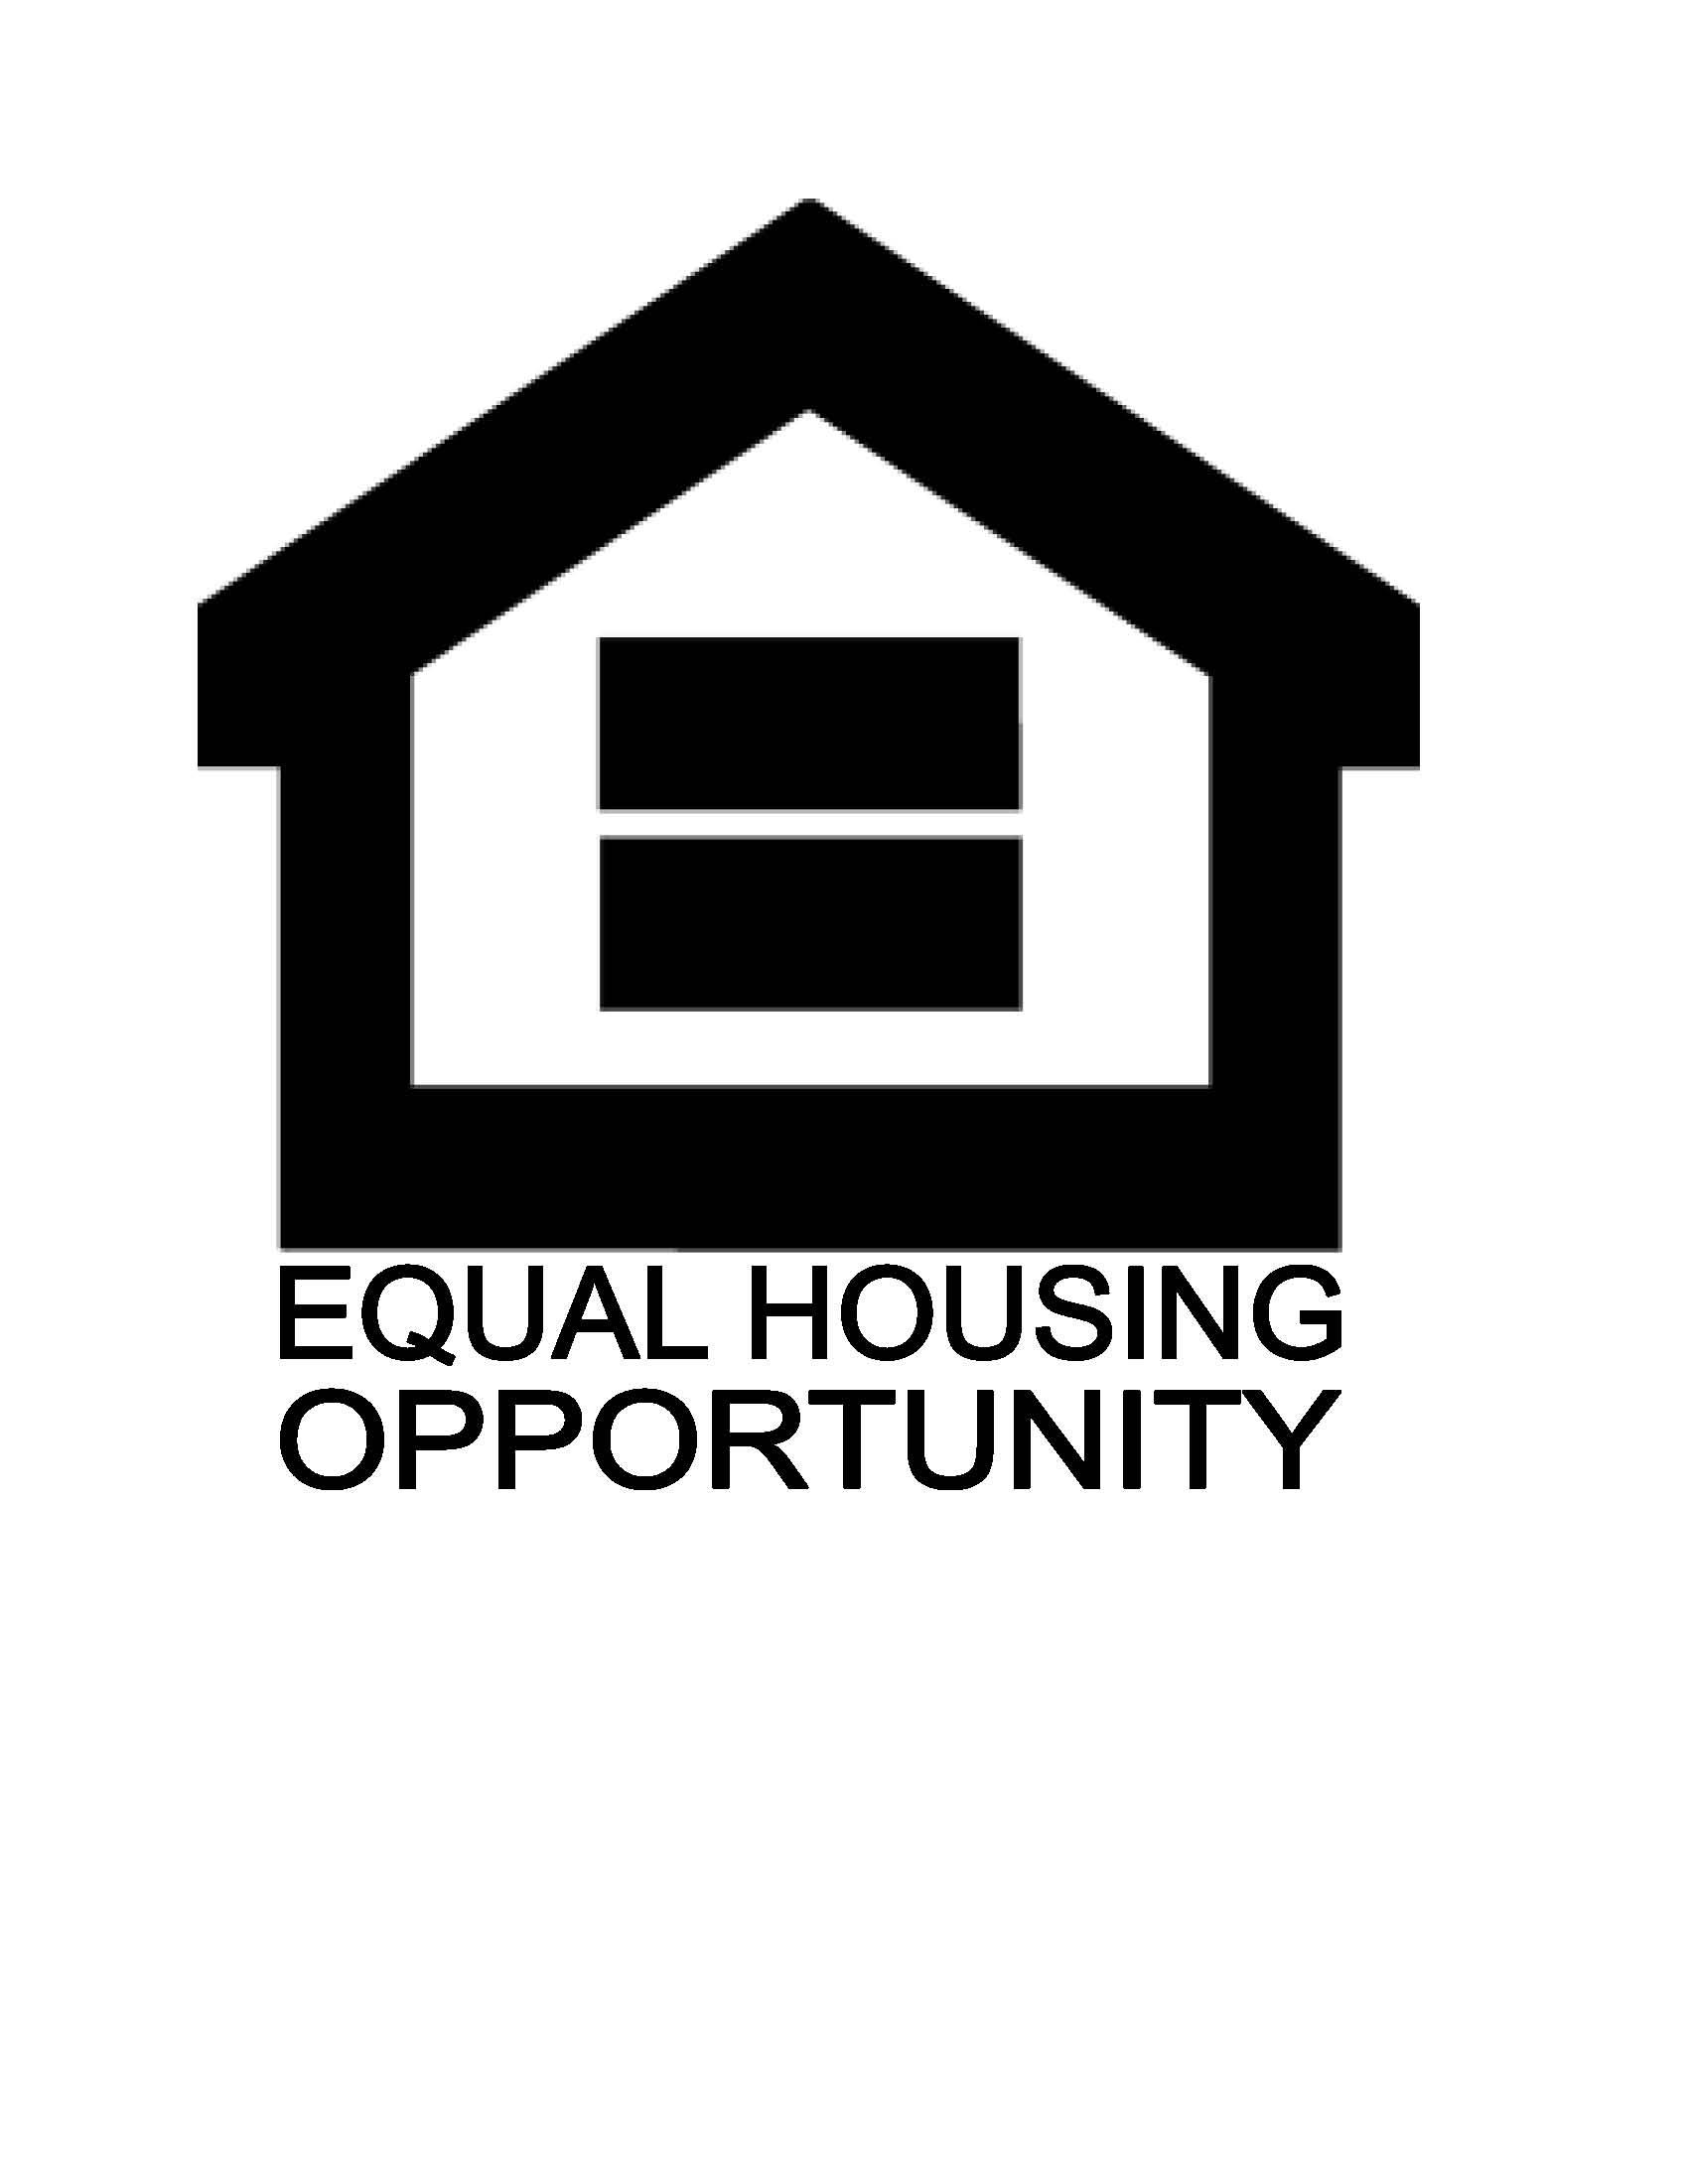 Sometimes Housing Seems Unfair